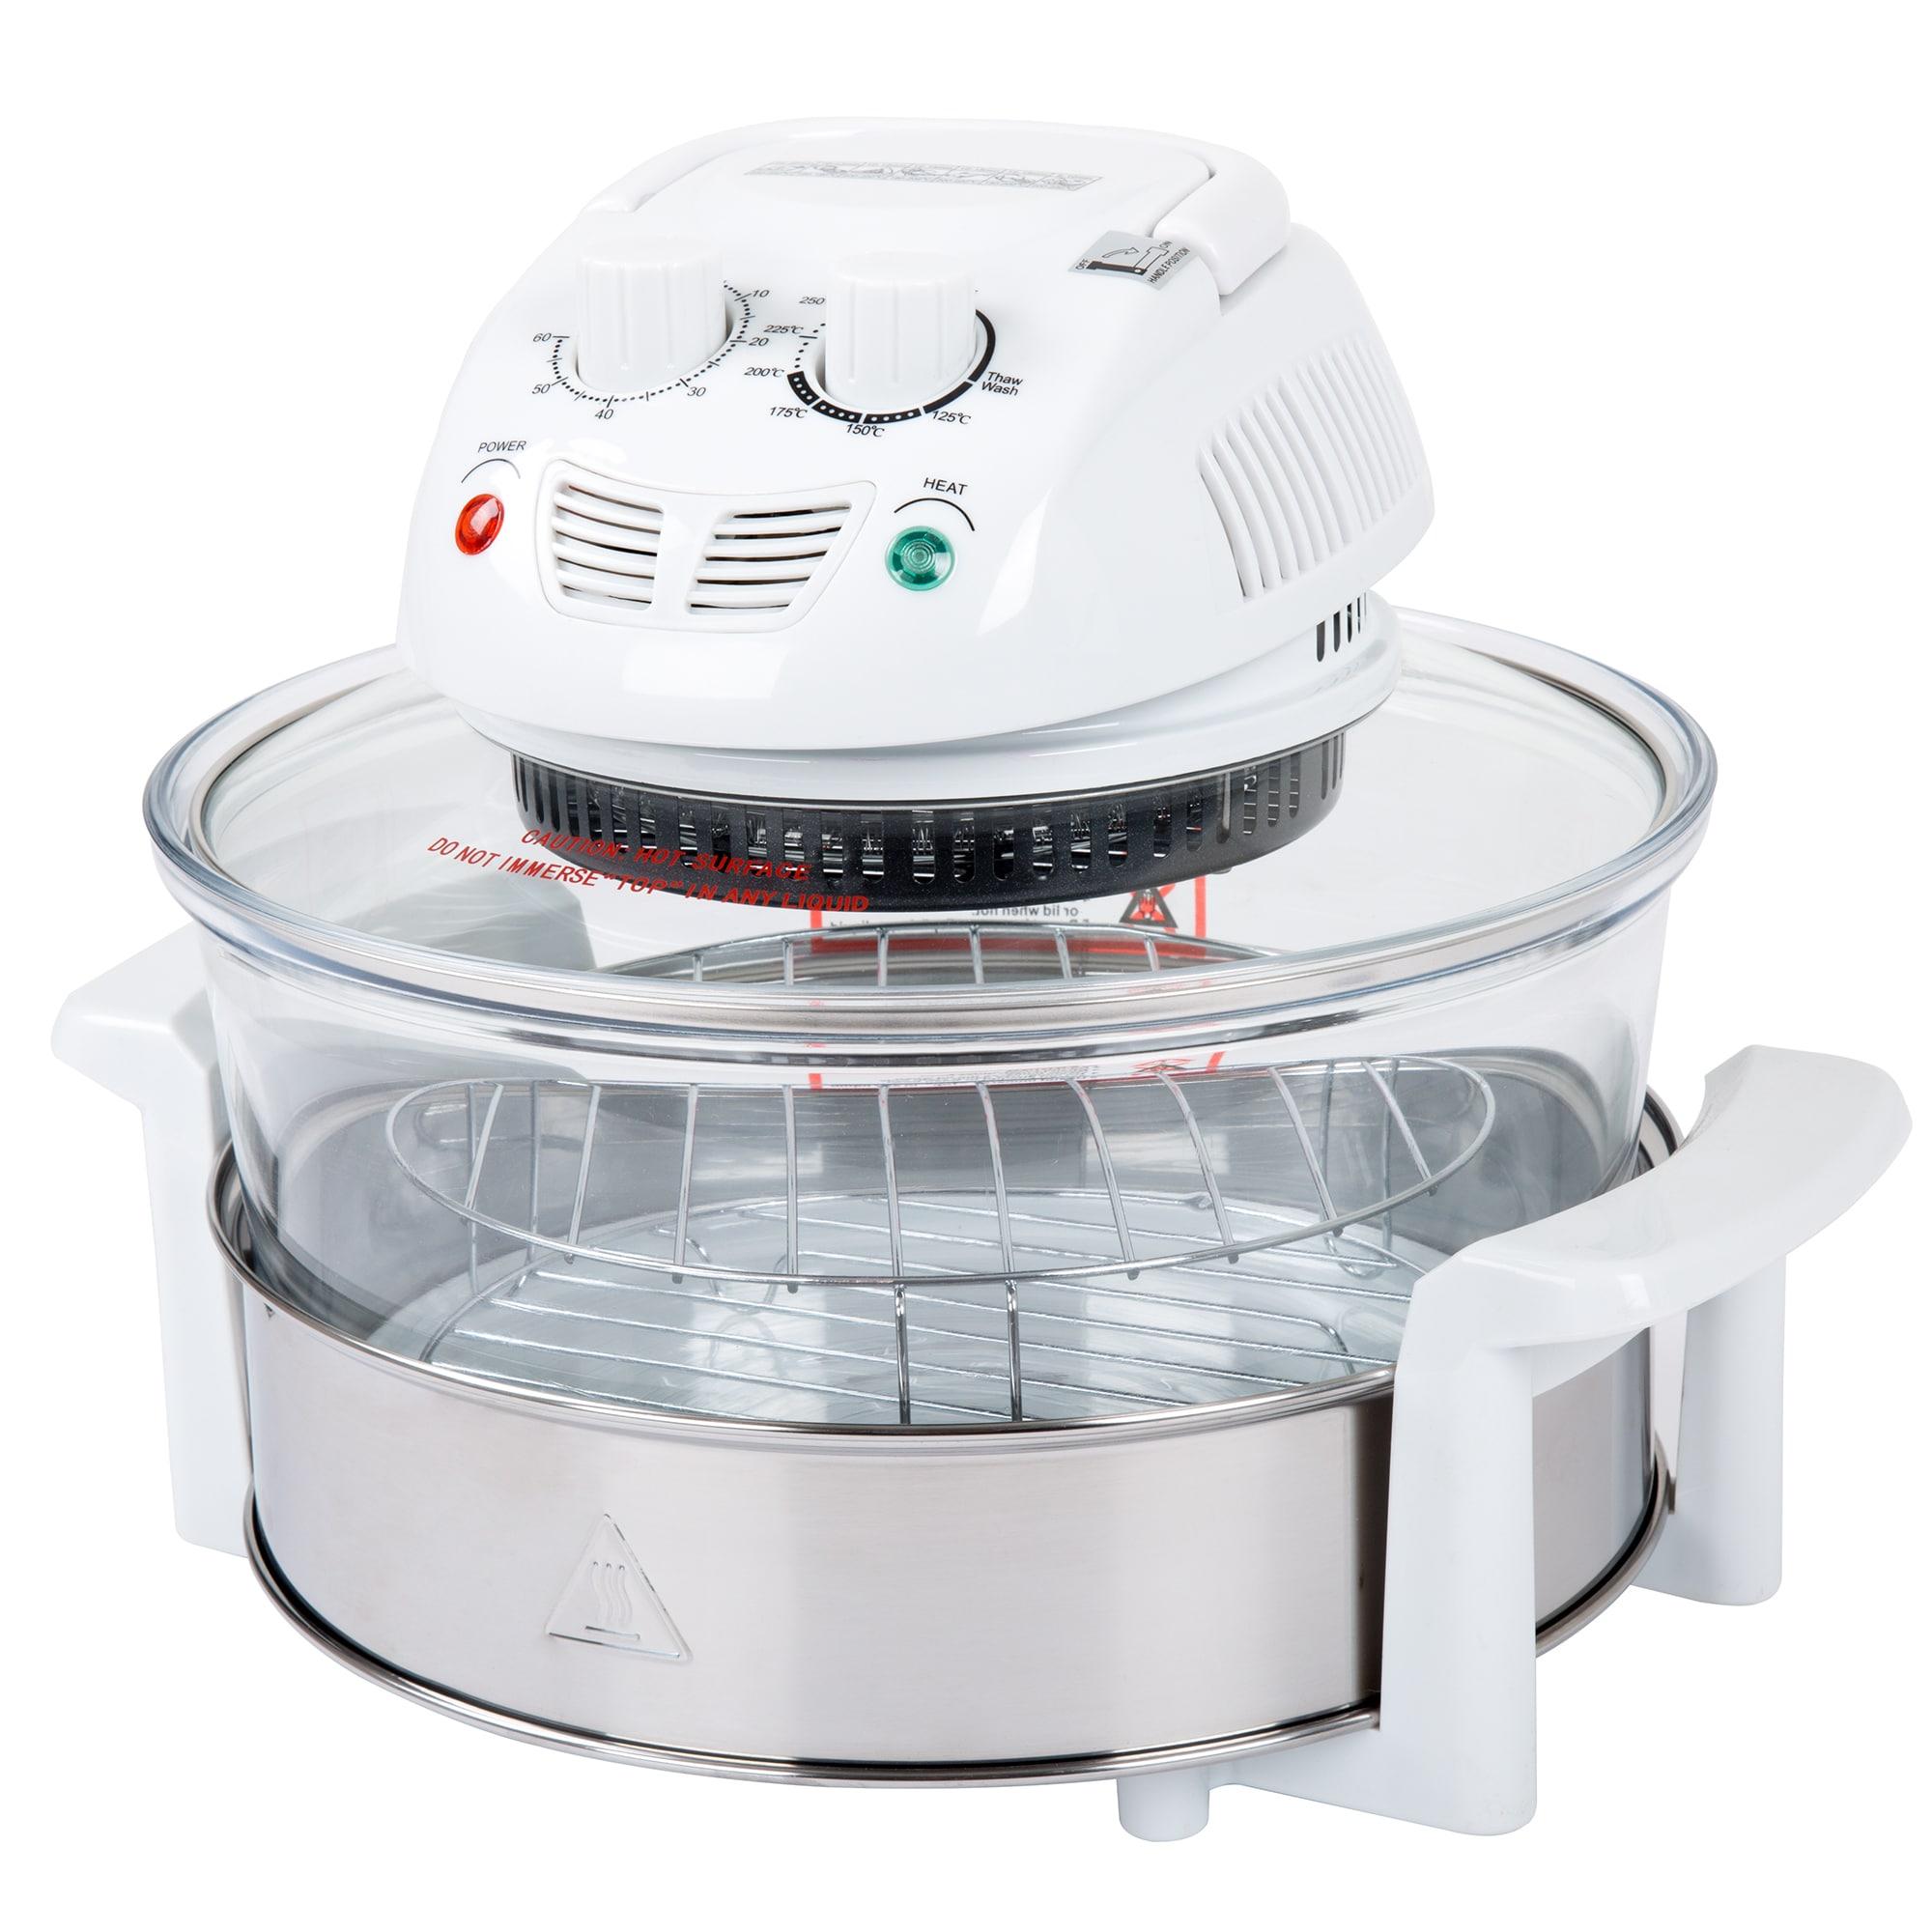 Classic Cuisine 12-17 Quart 1200W Halogen Tabletop Oven -...